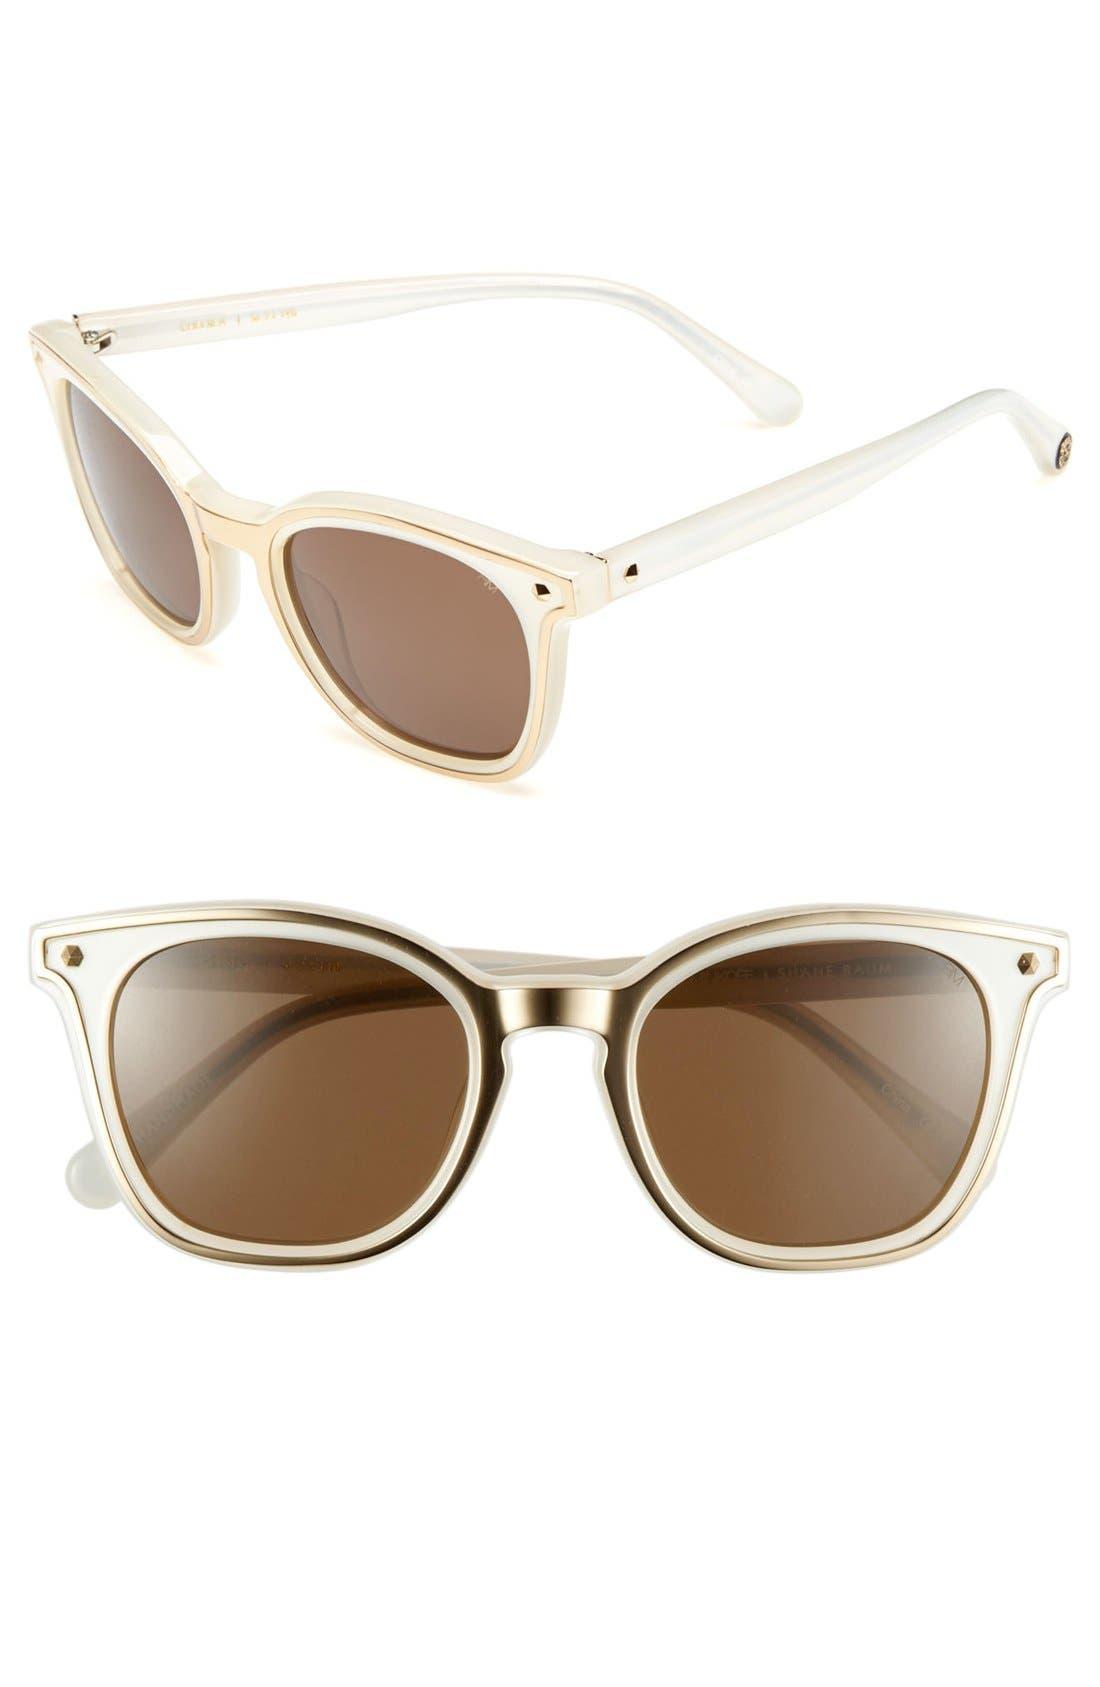 Alternate Image 1 Selected - Rebecca Minkoff 'Chelsea' Sunglasses